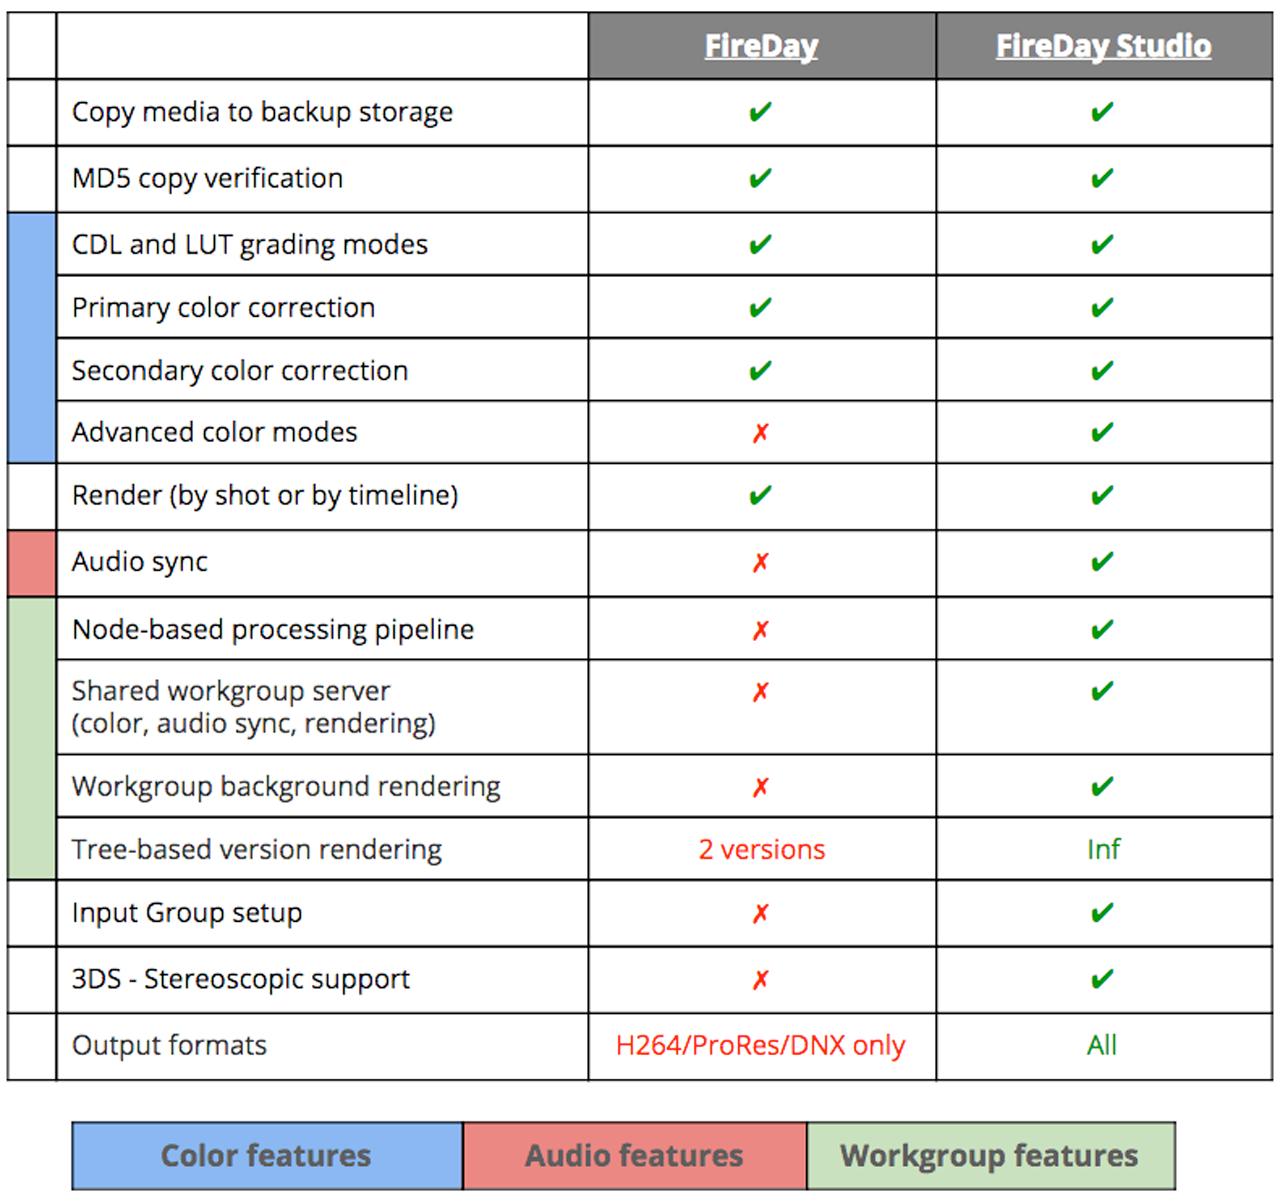 firefly fireday comparison chart